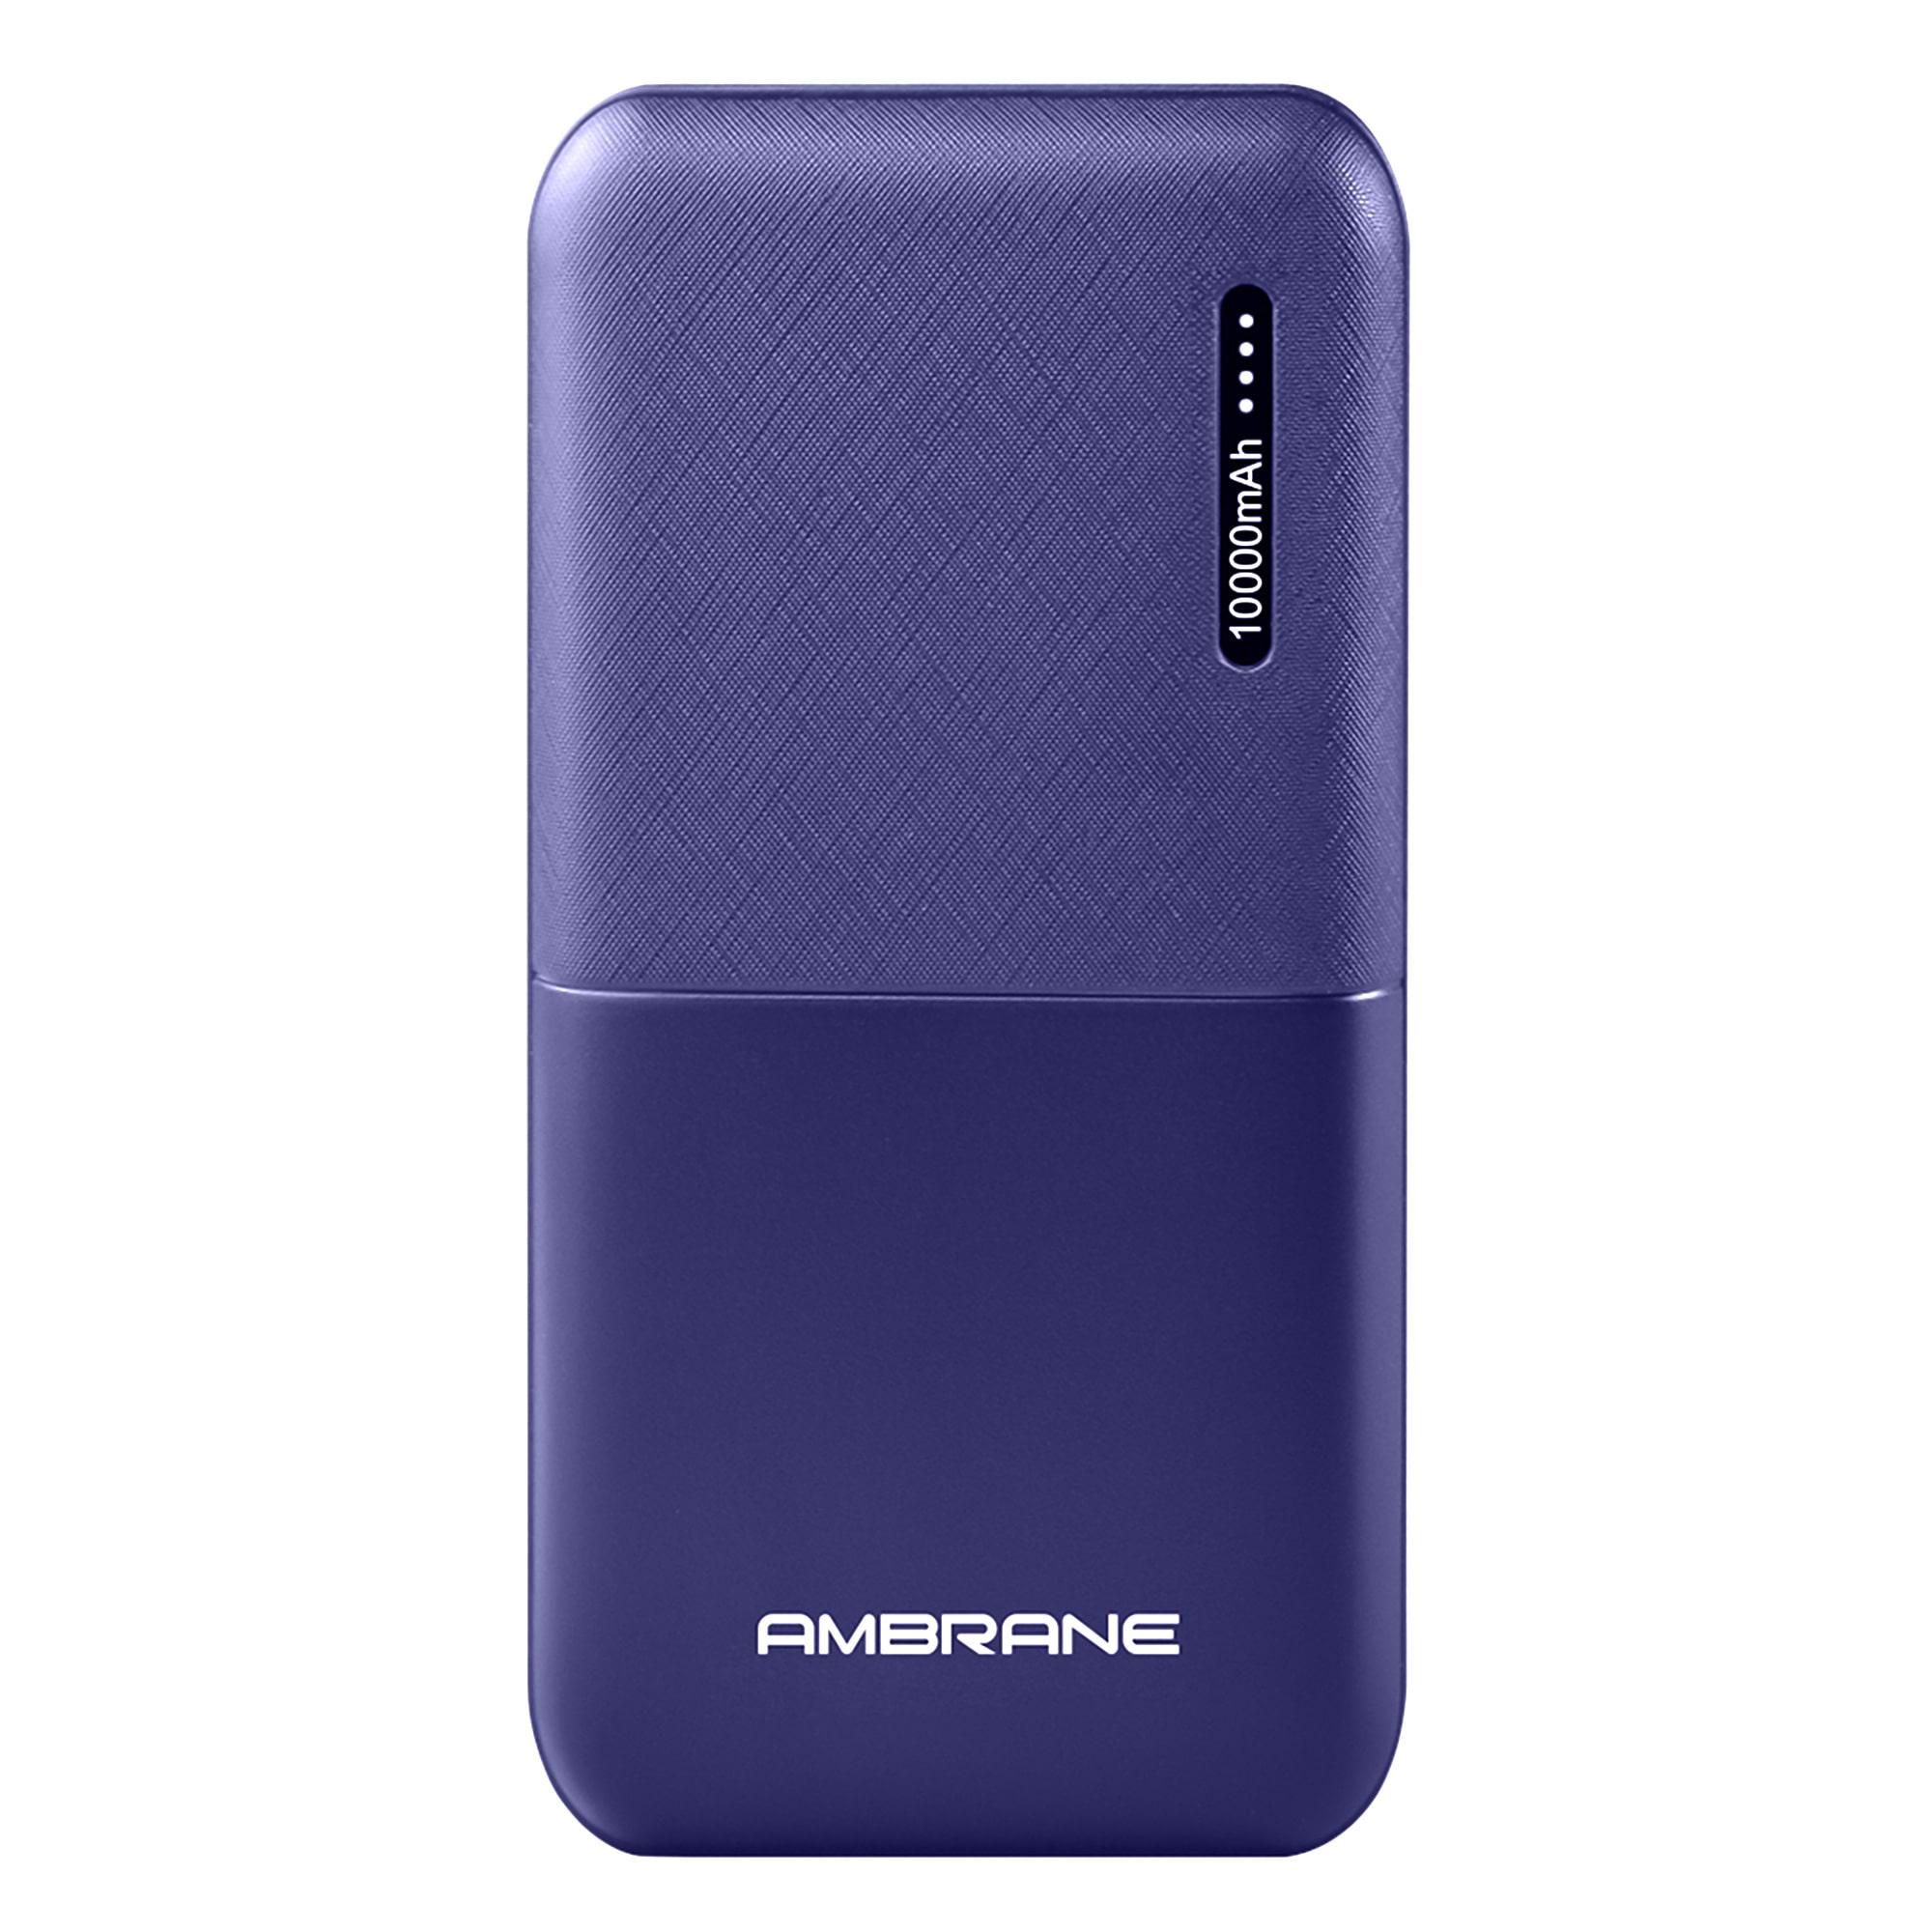 Ambrane PP-111 10000 mAh Portable Power Bank - Blue